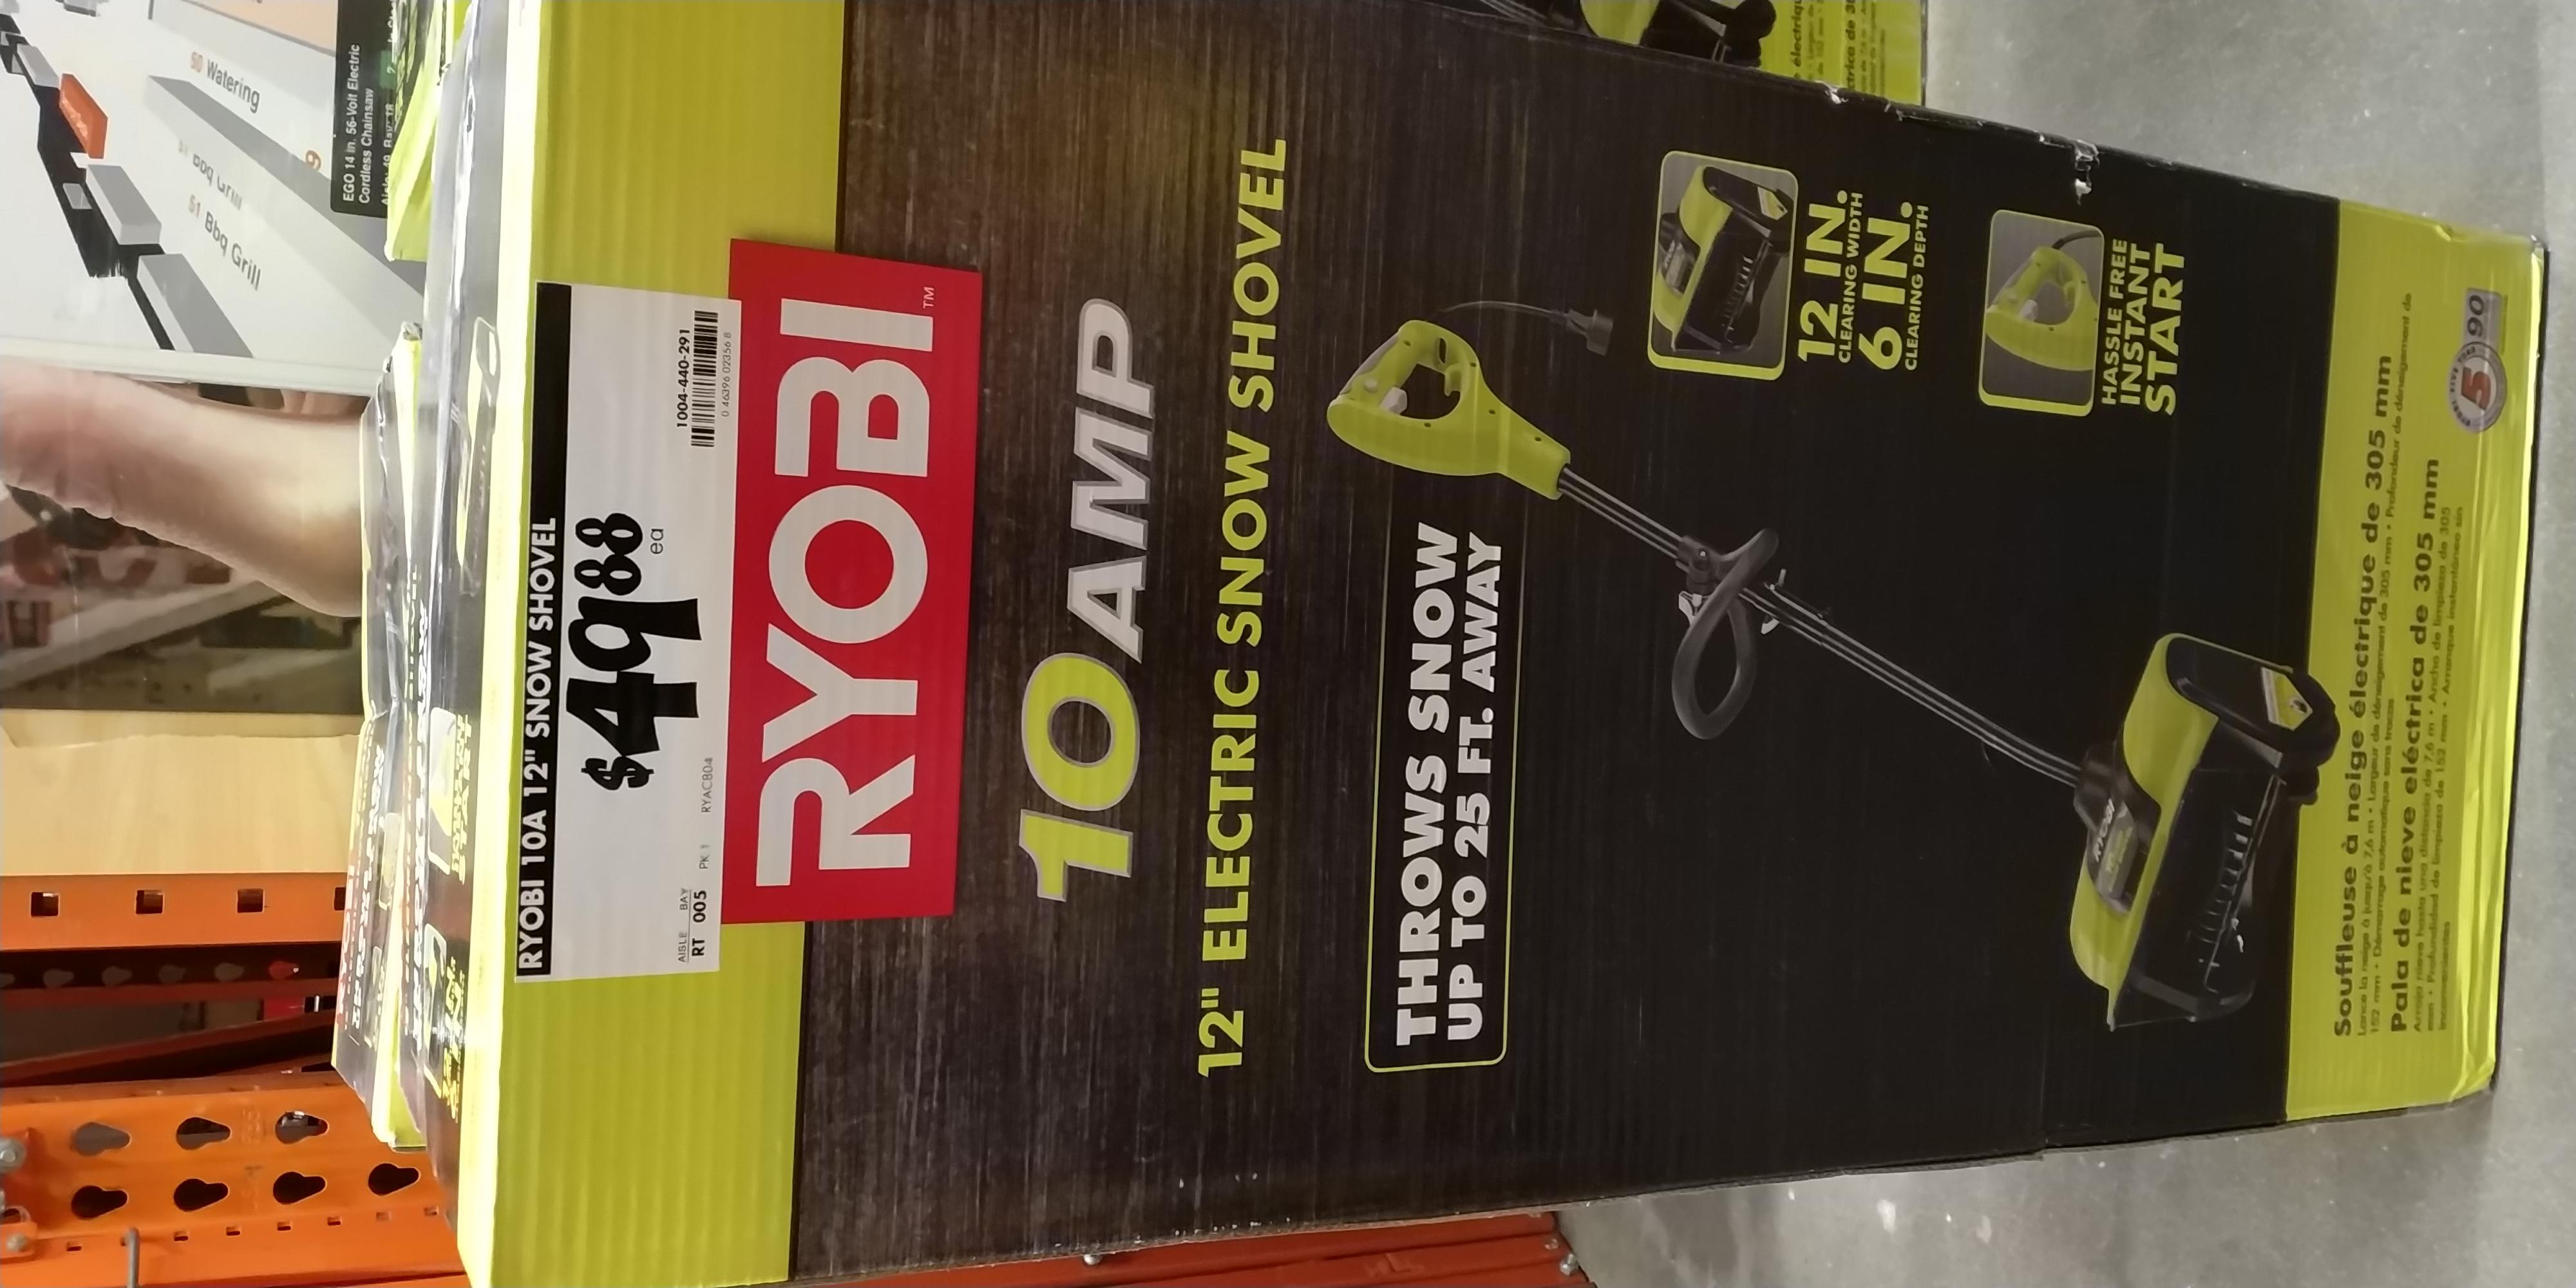 Ryobi 12 inch Electric Snow Shovel - $49.88 @ Home Depot